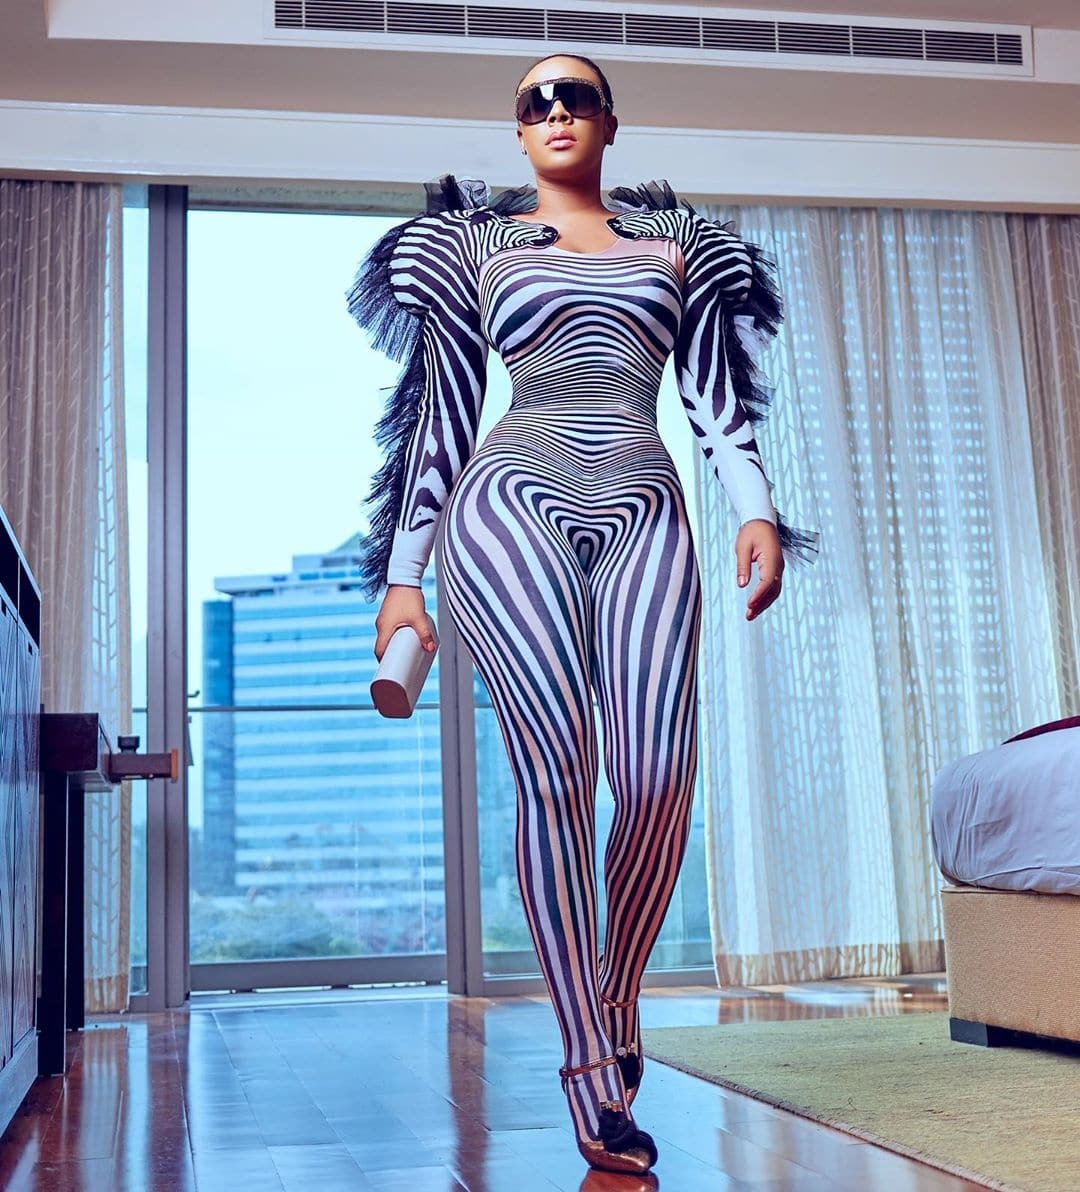 Hailliey-sumney-zebra-print-animal-print-inspired-jumpsuit